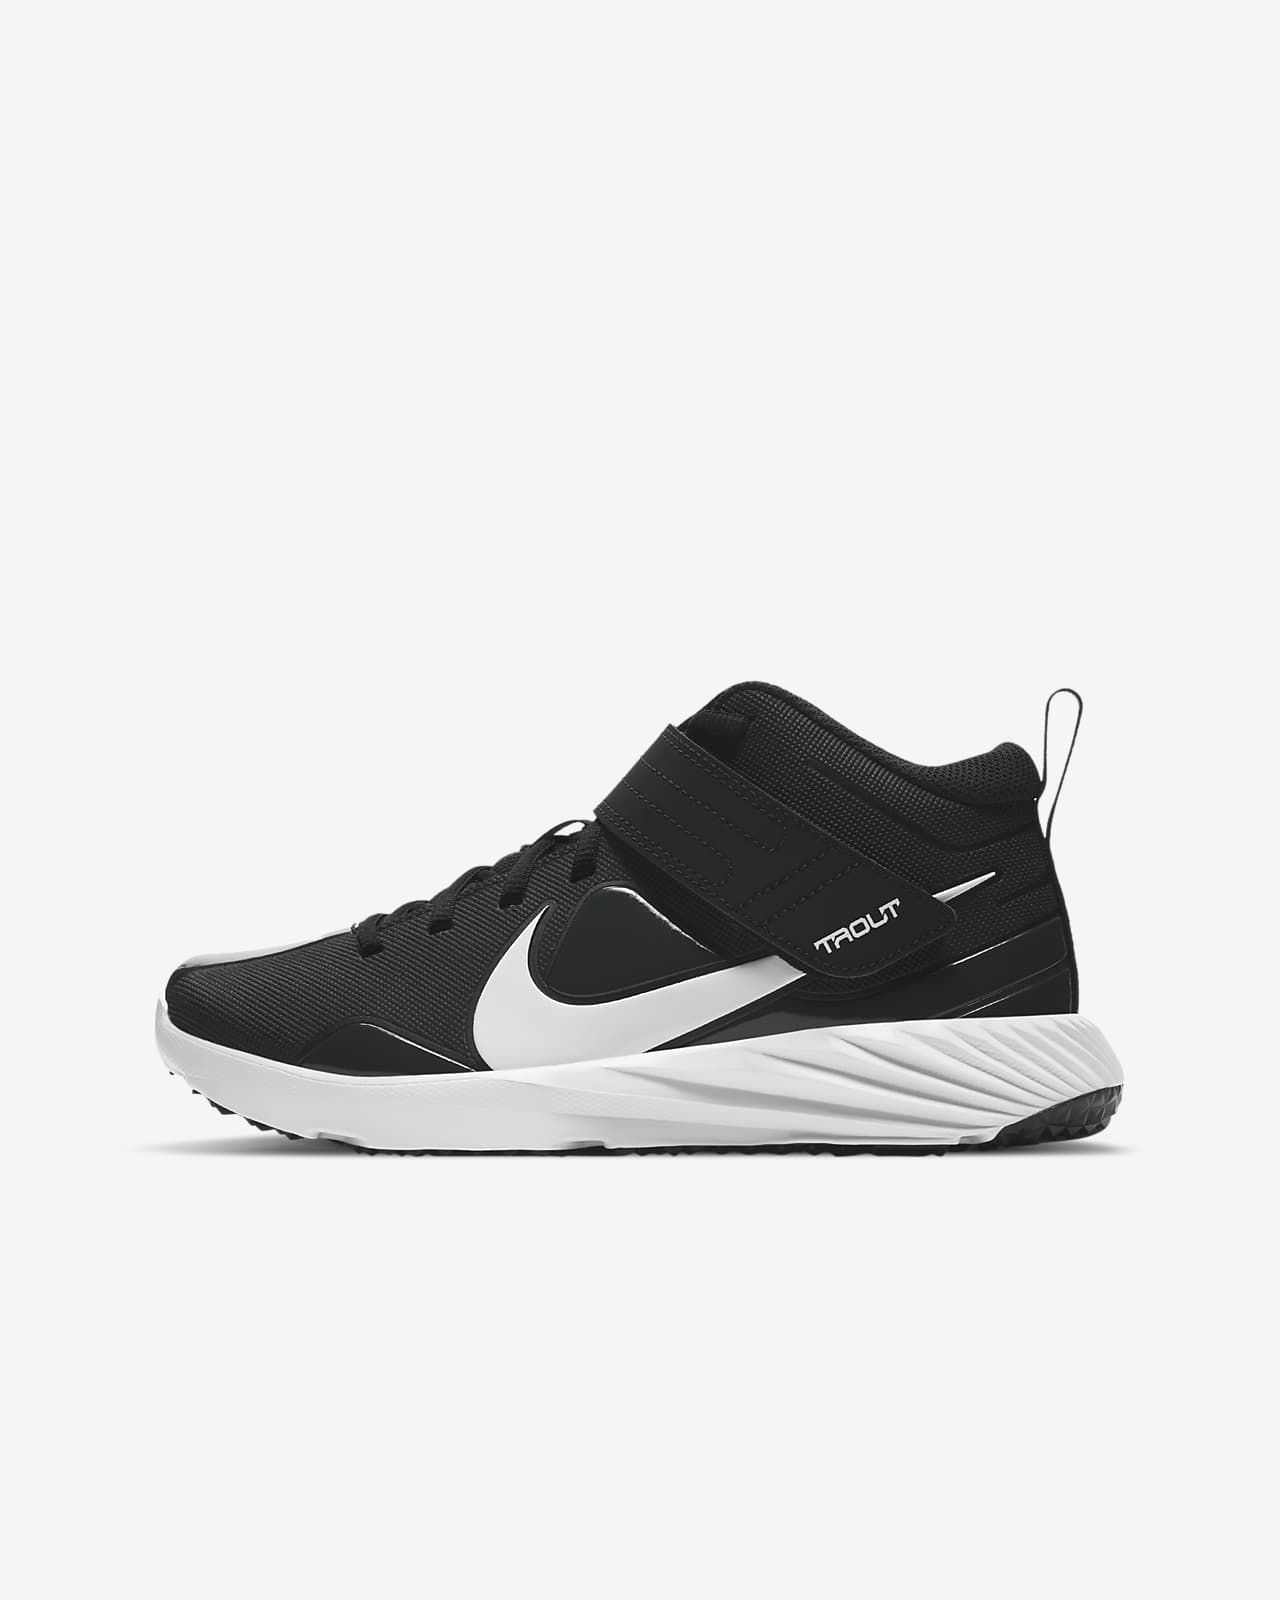 Nike Force Trout 7 Turf Little/Big Kids' Baseball Shoes